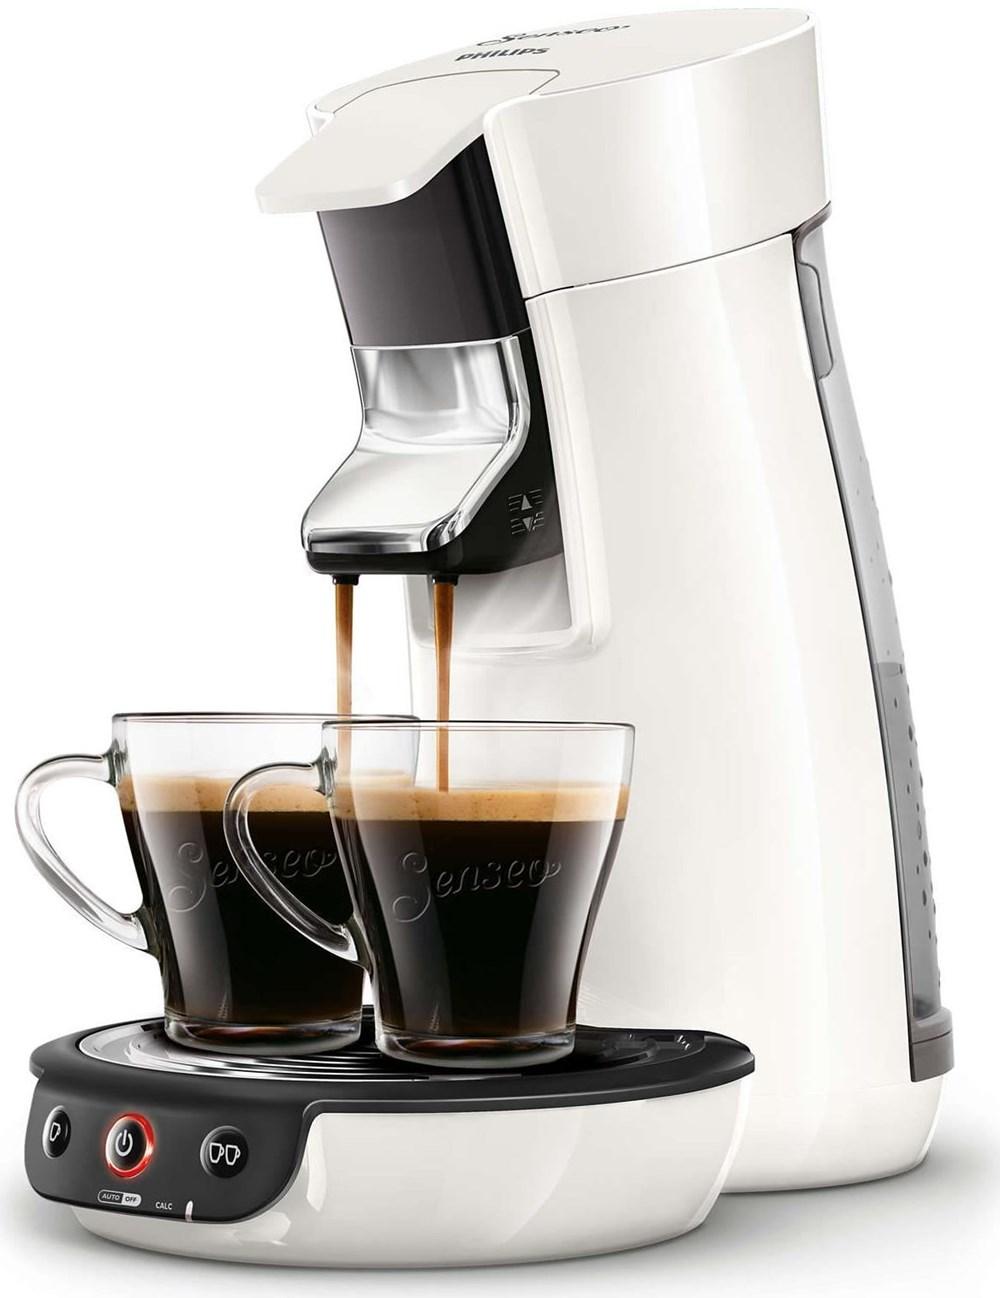 Philips Senseo HD7829/09 Viva Café weiß mit 200 Pads Gratis